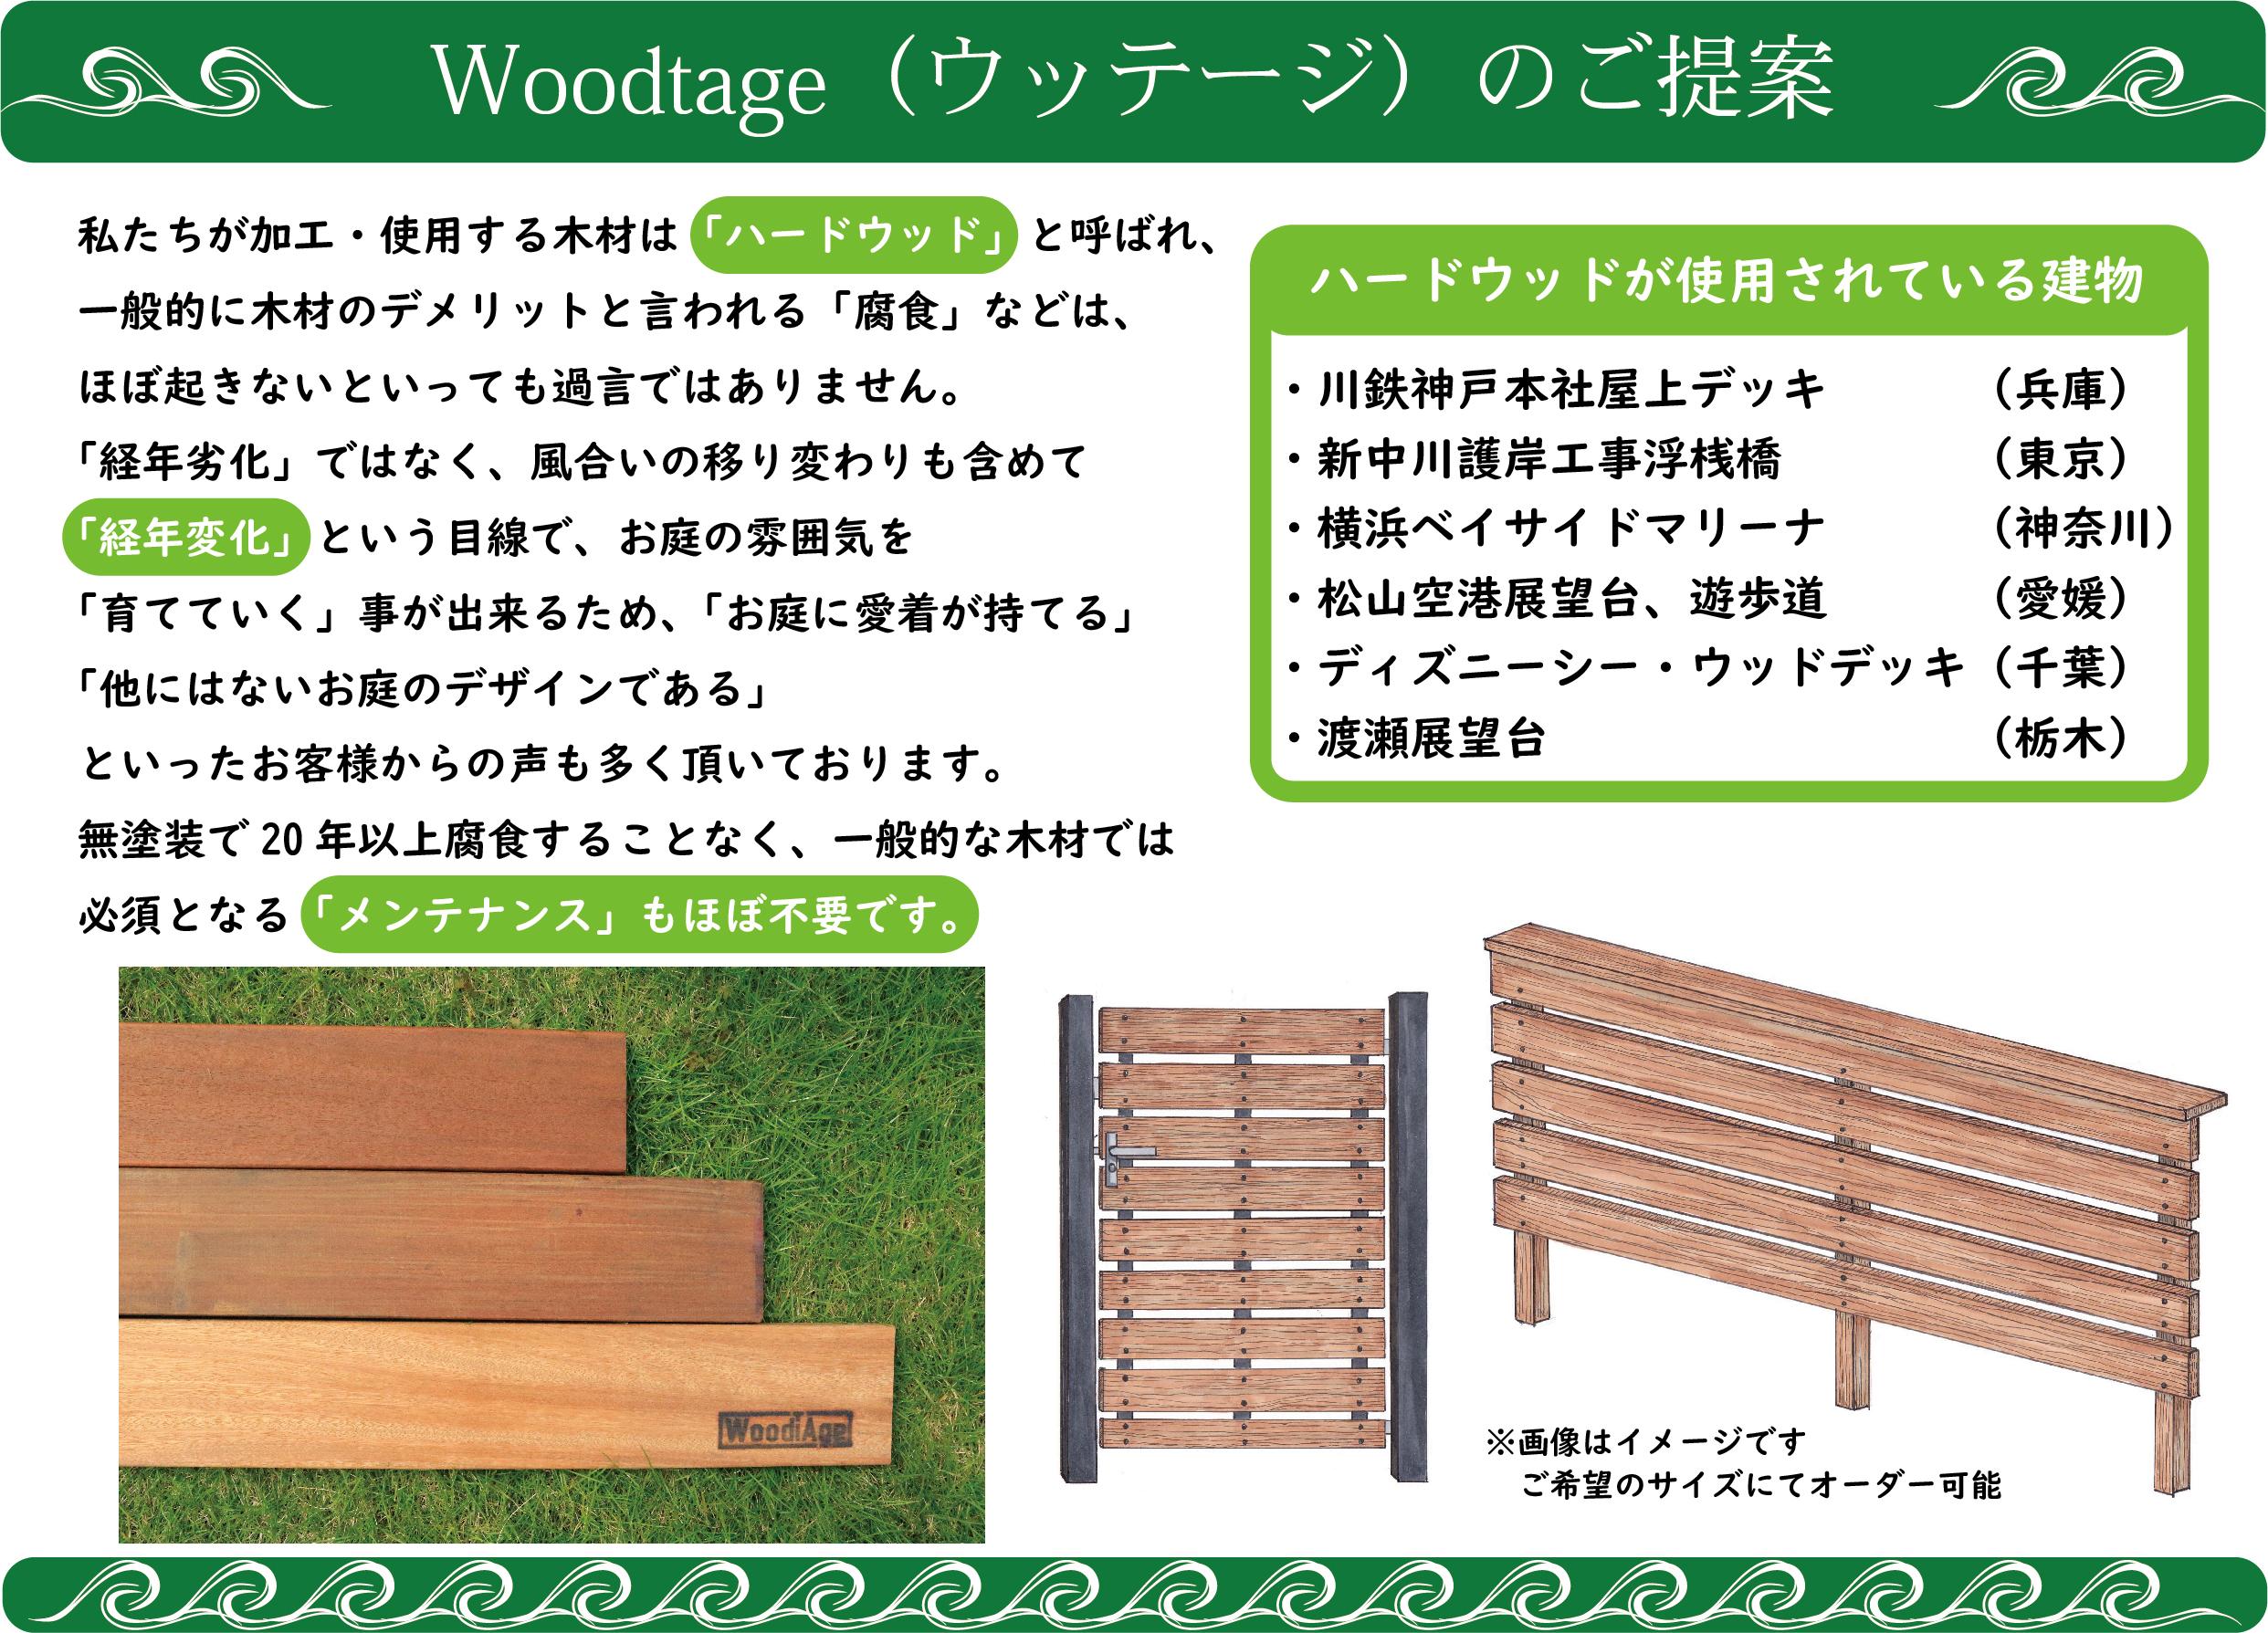 Woodtageページ用画像製品案内3